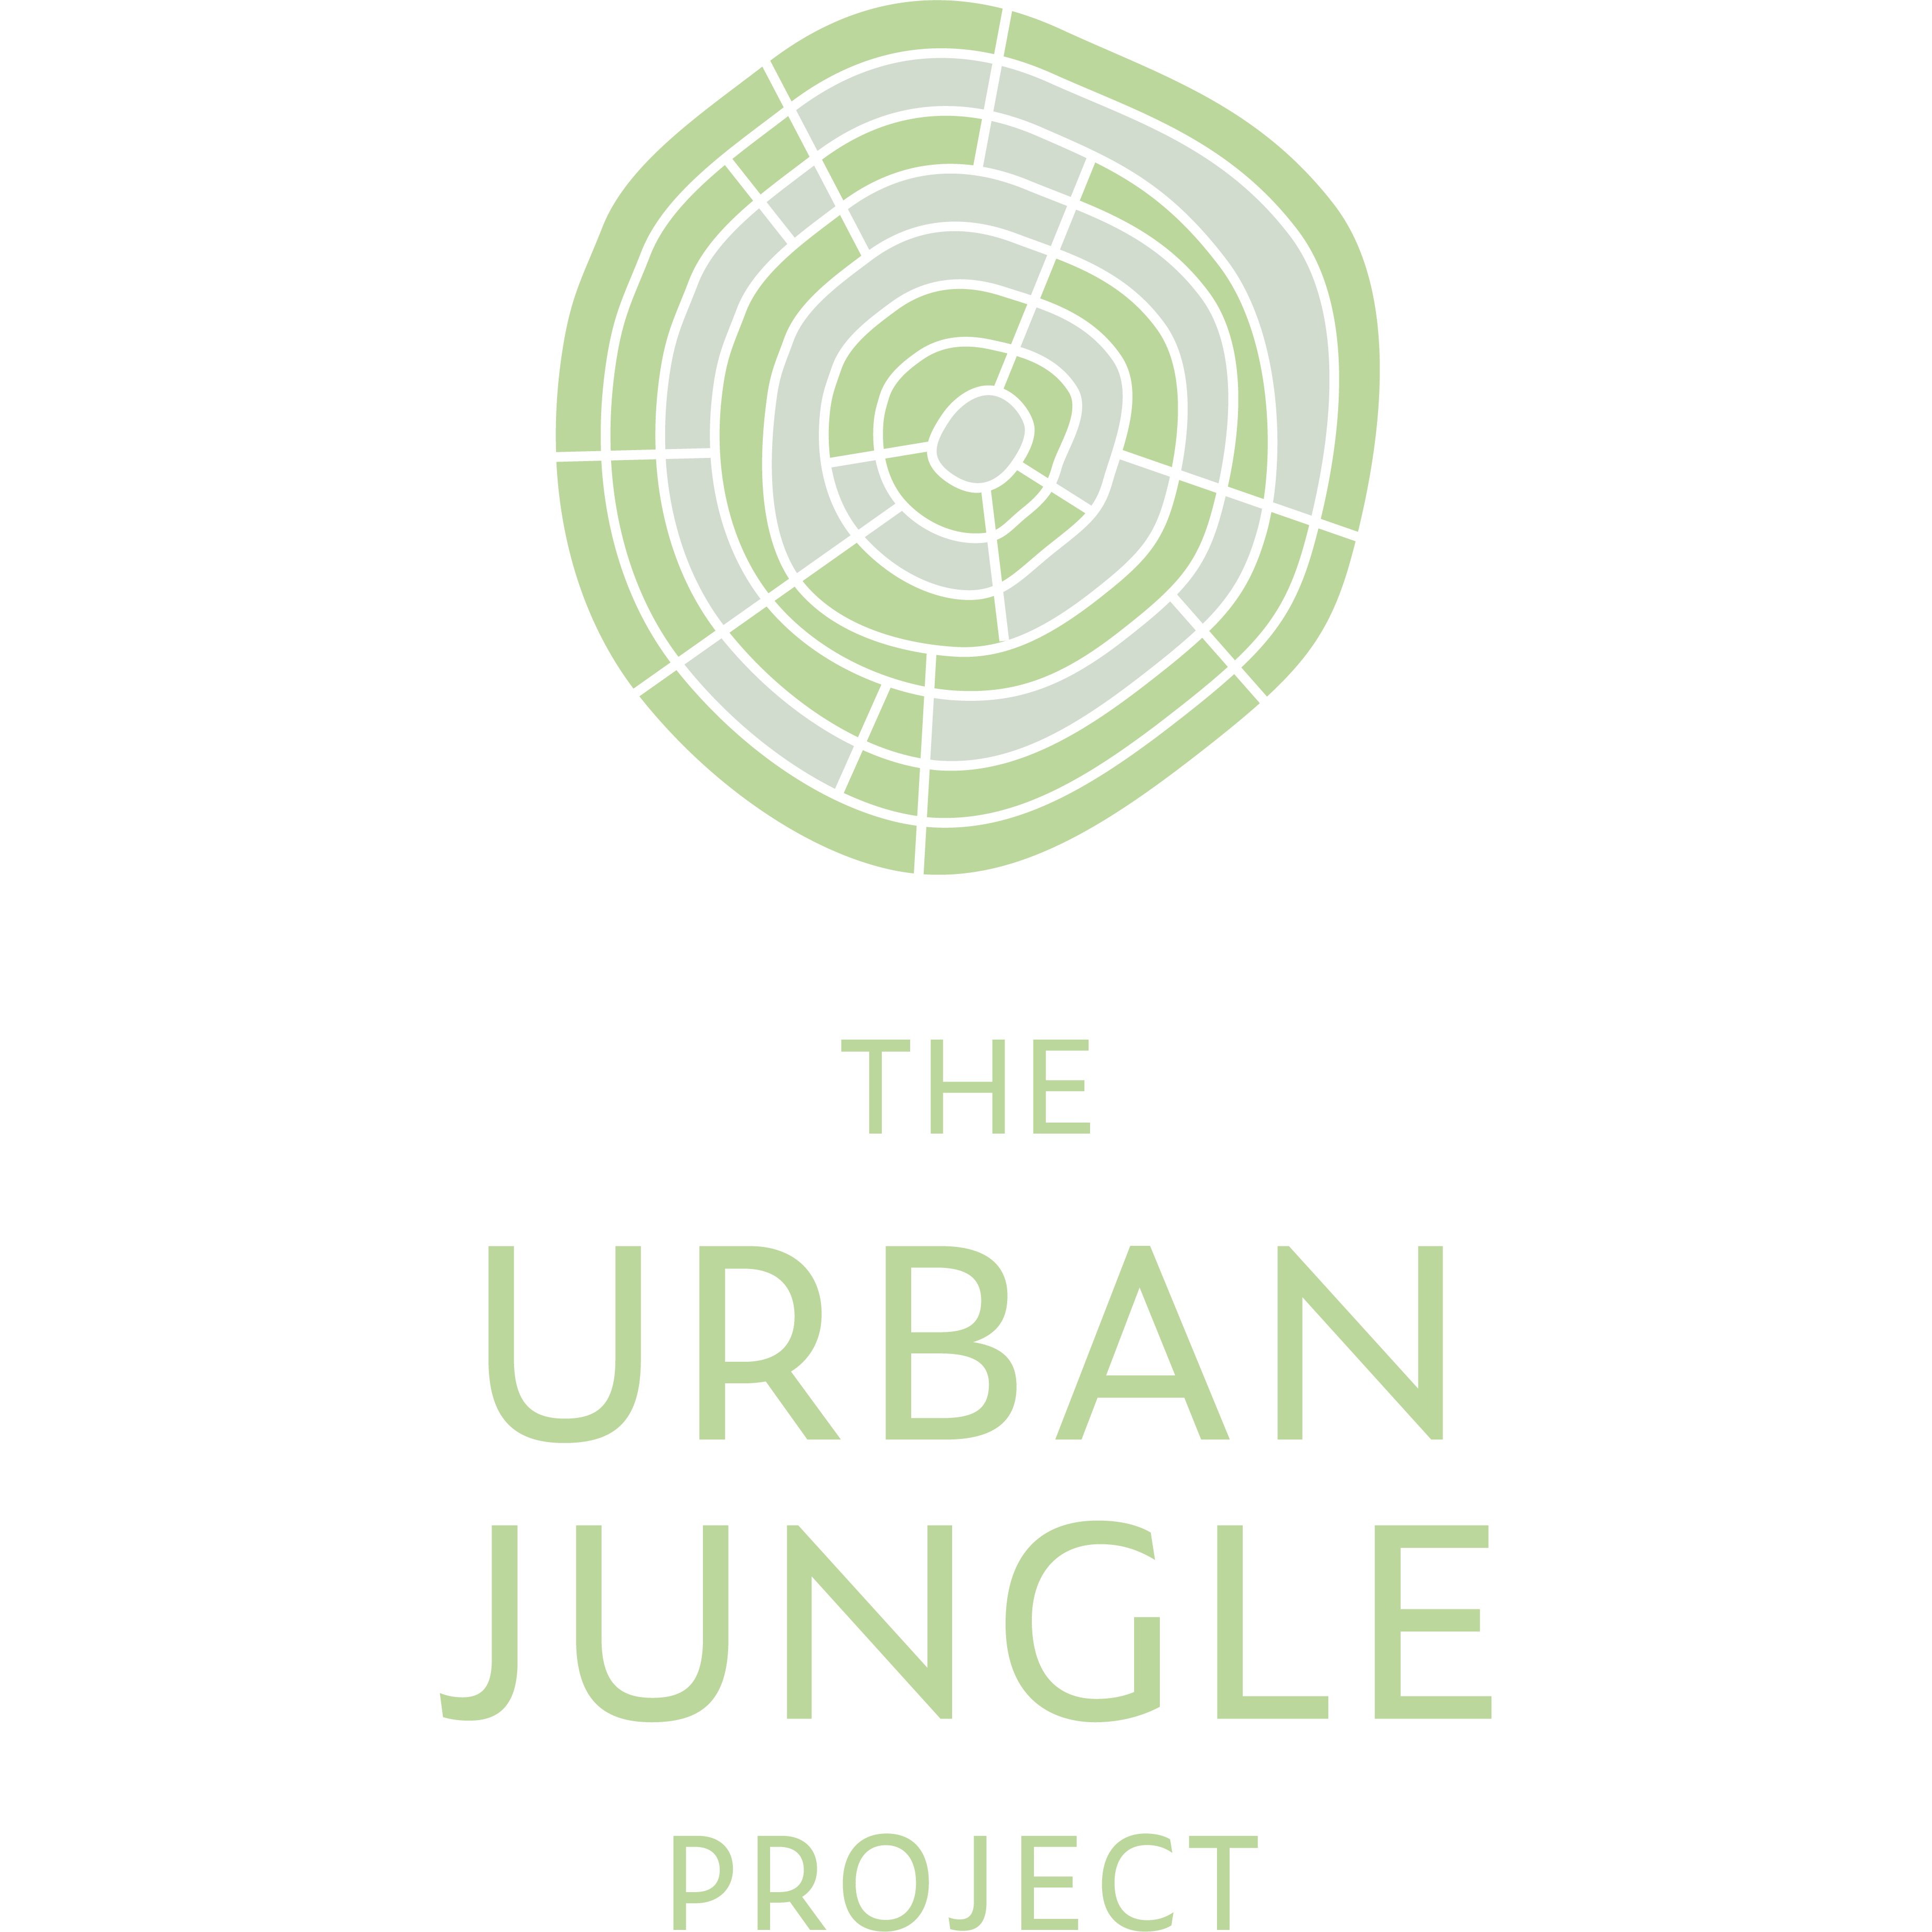 Urban jungle project